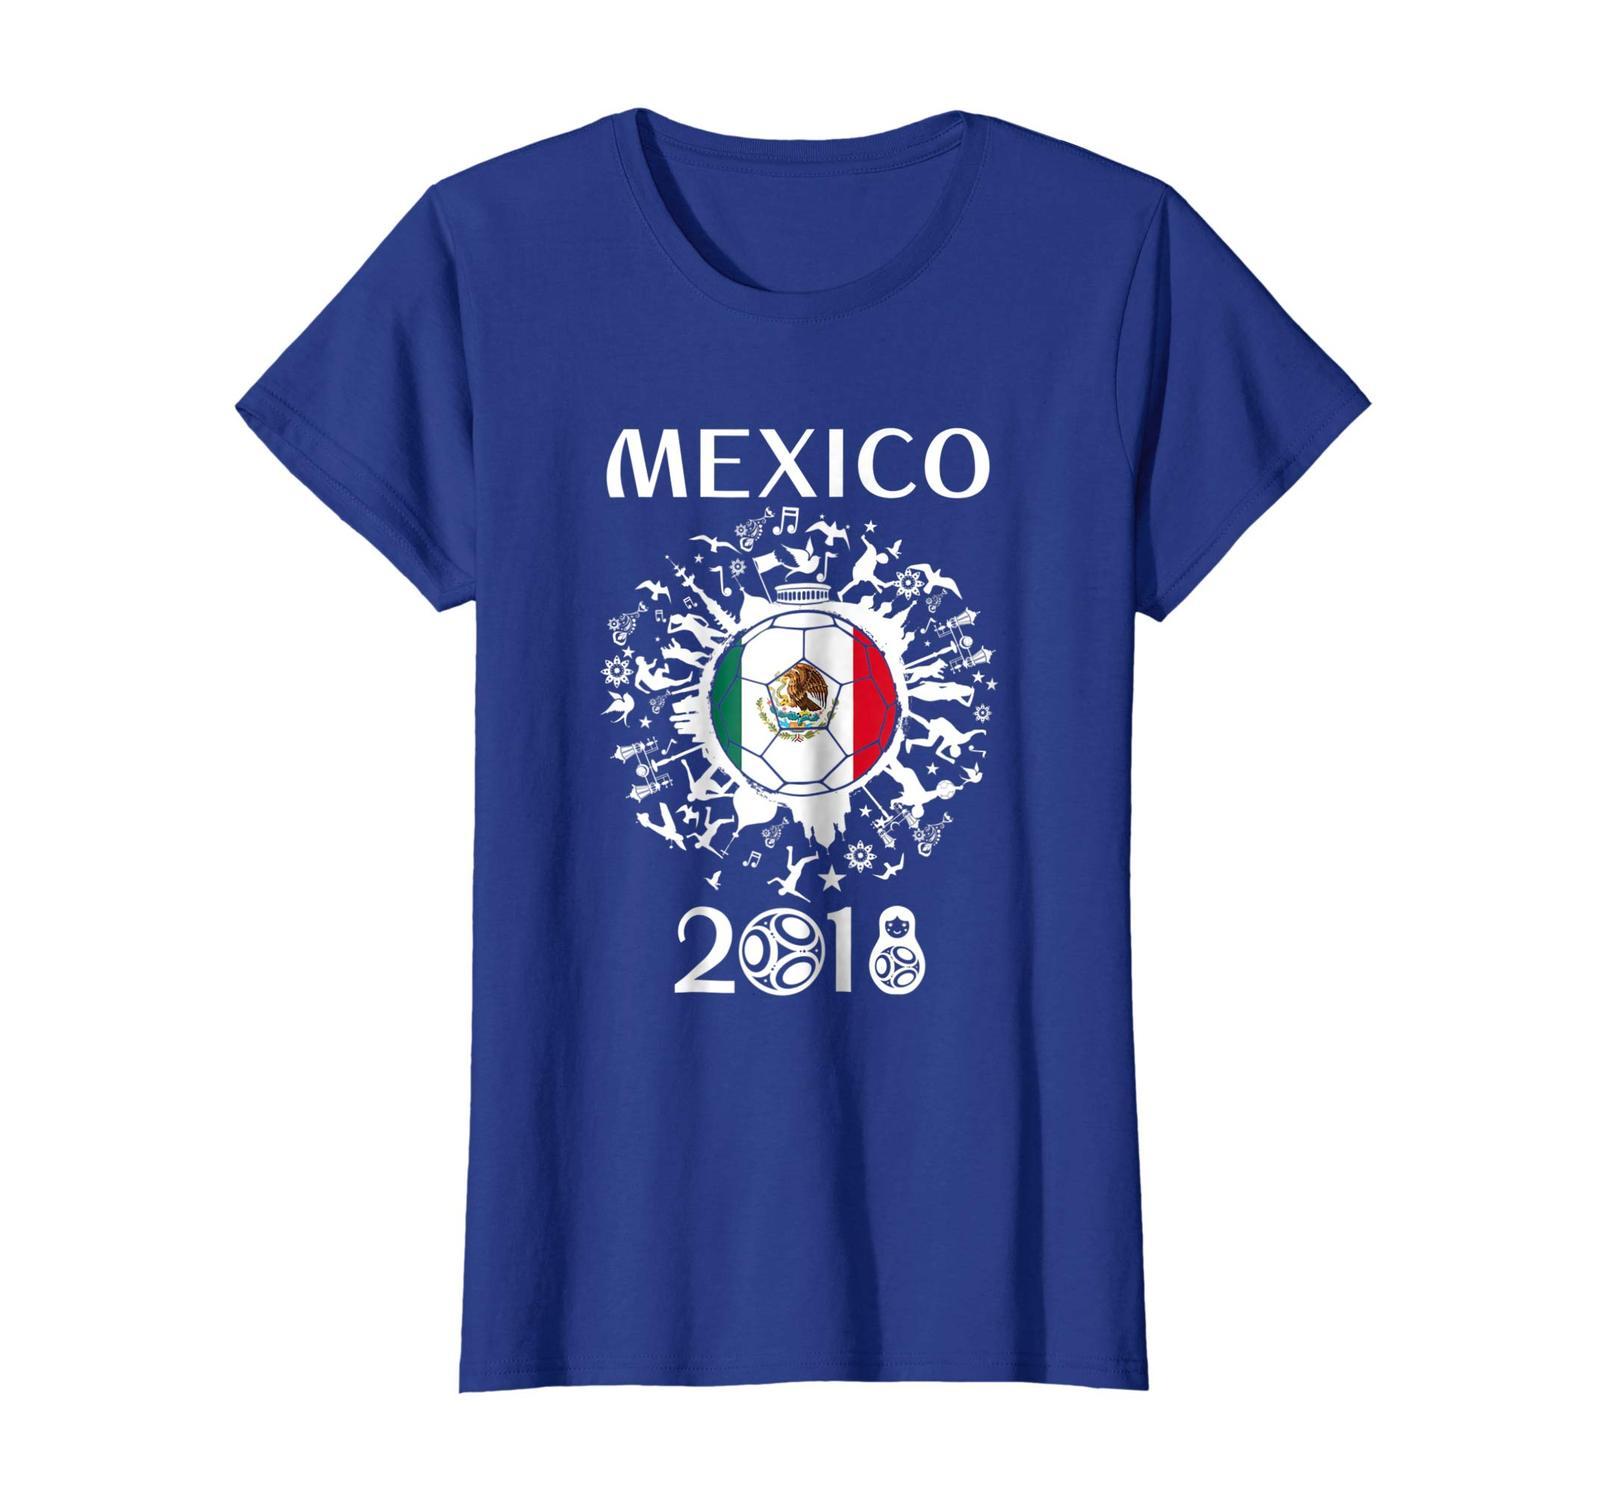 Sport Shirts - World Football 2018 Mexico Jersey Soccer Team Gift Tshirt Wowen